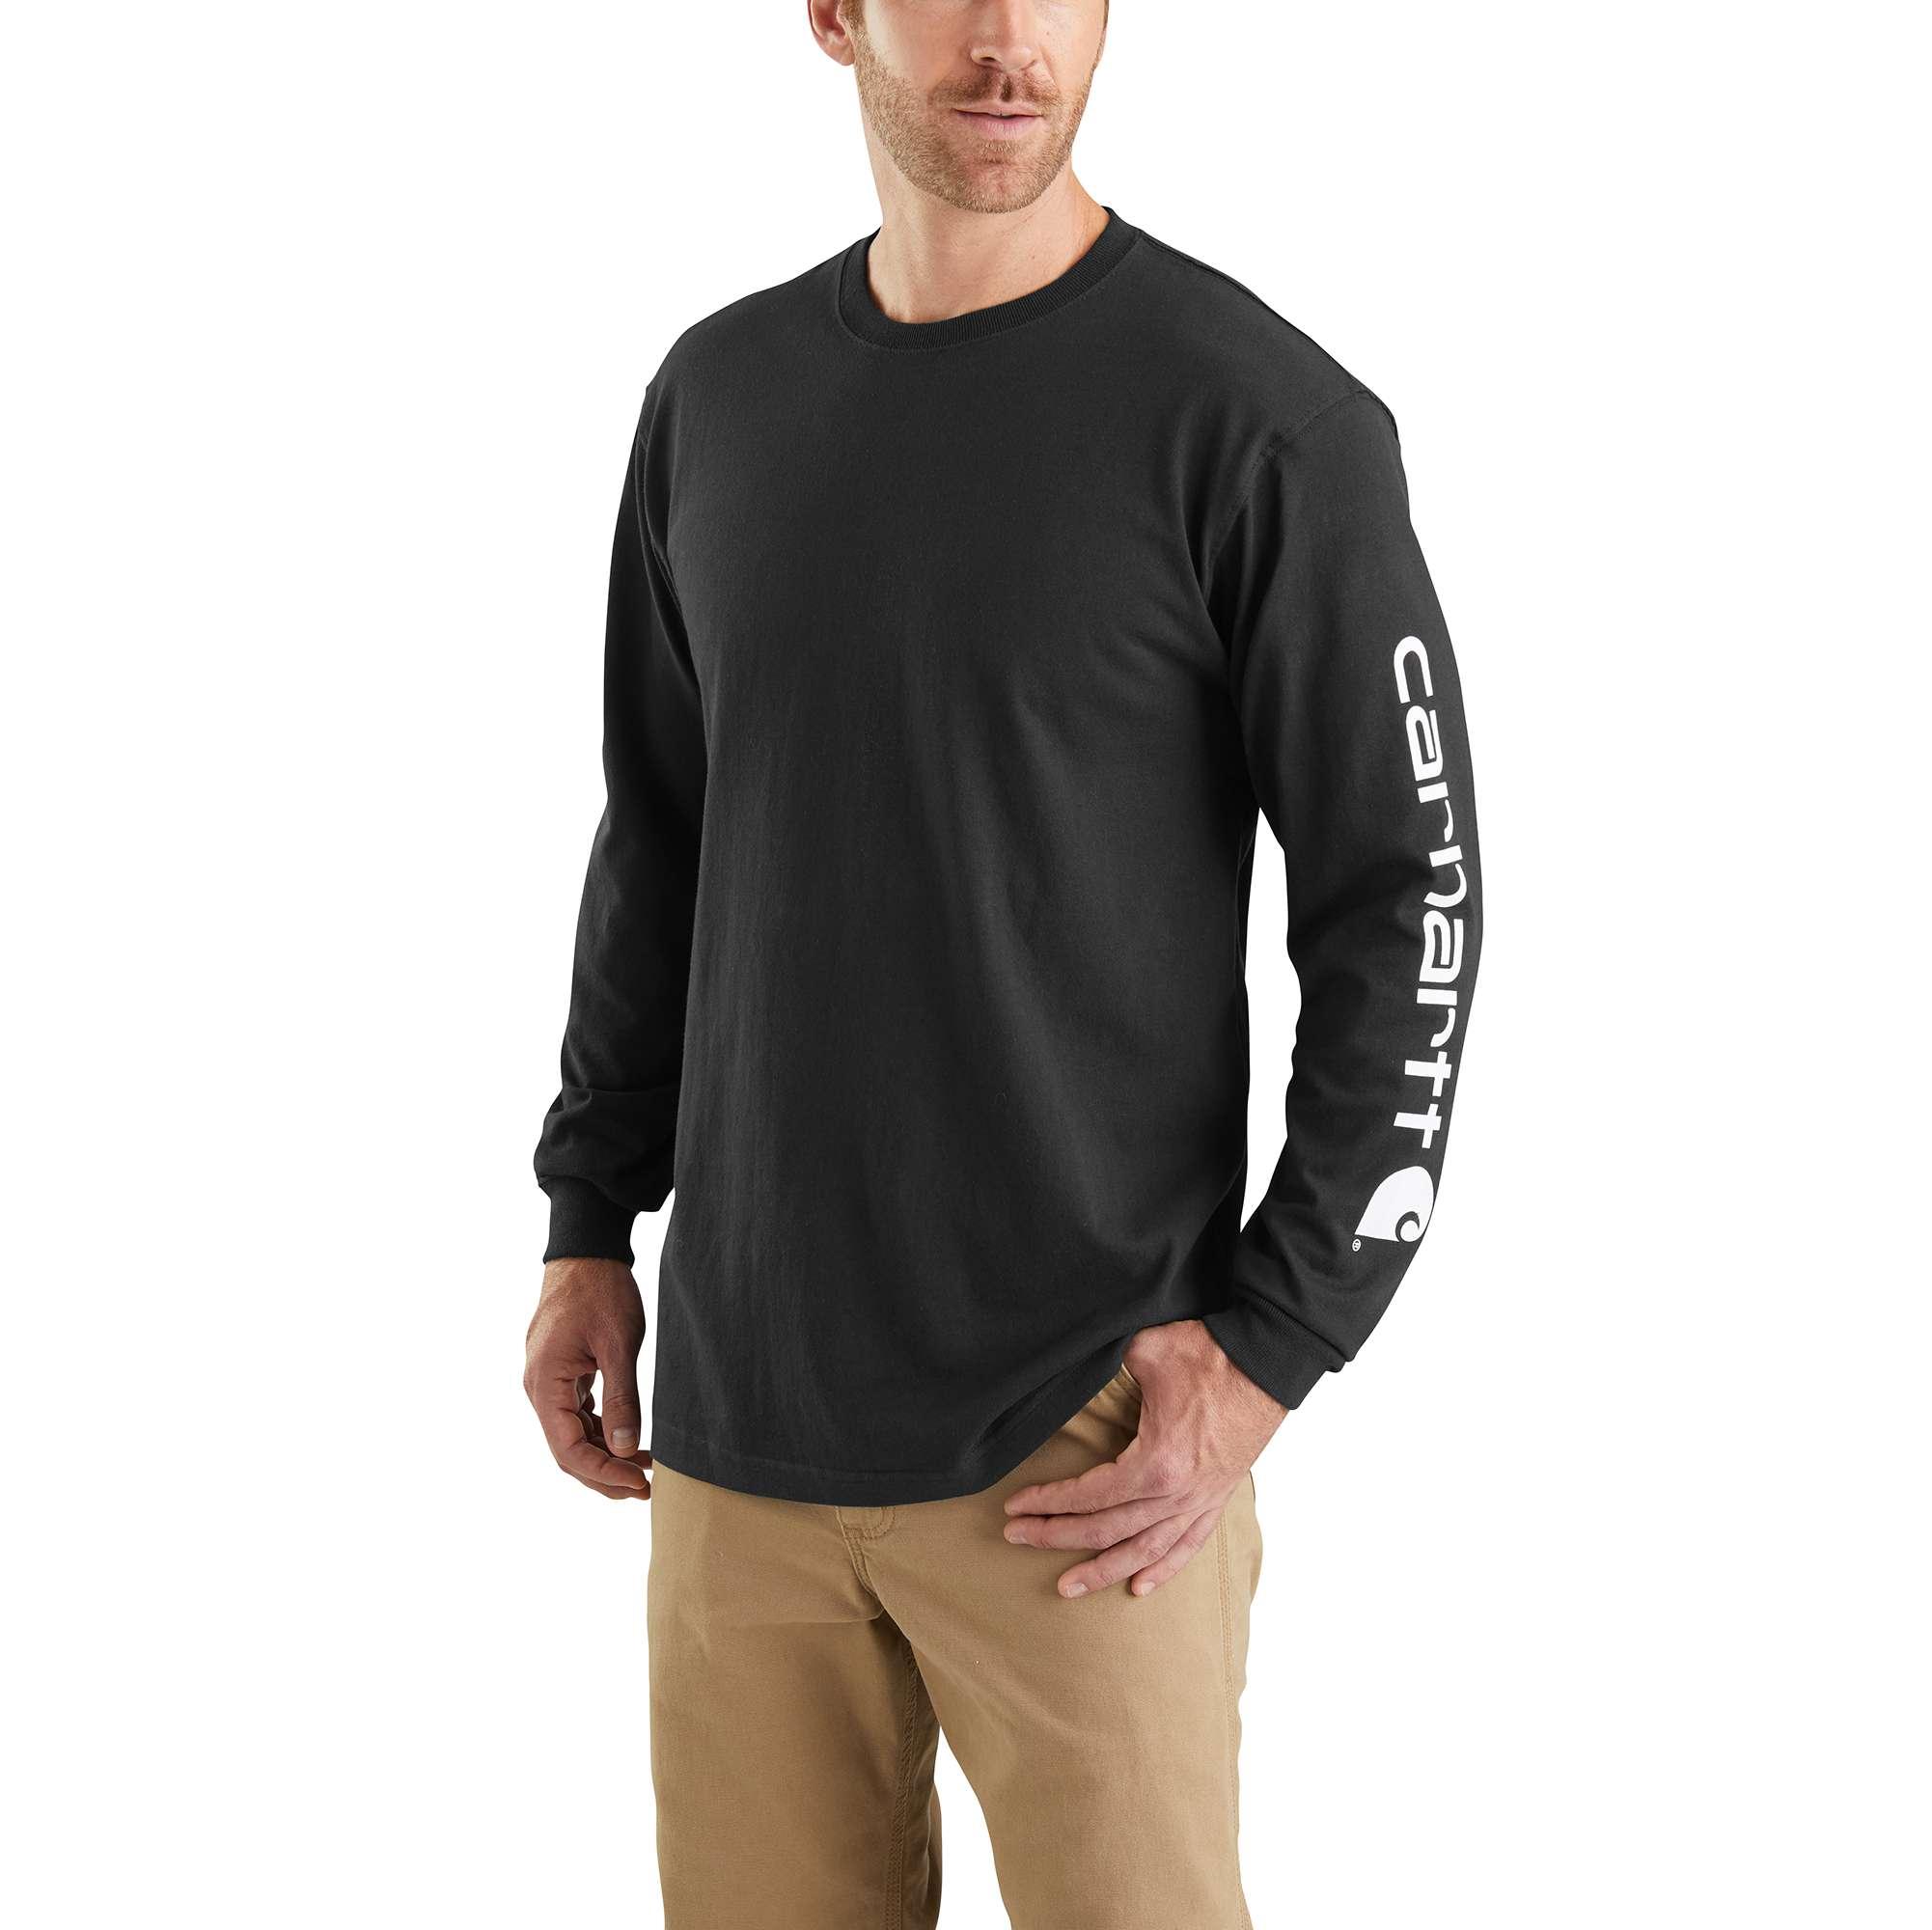 Men's Workwear Long-Sleeve Graphic Logo T-Shirt, Black, swatch